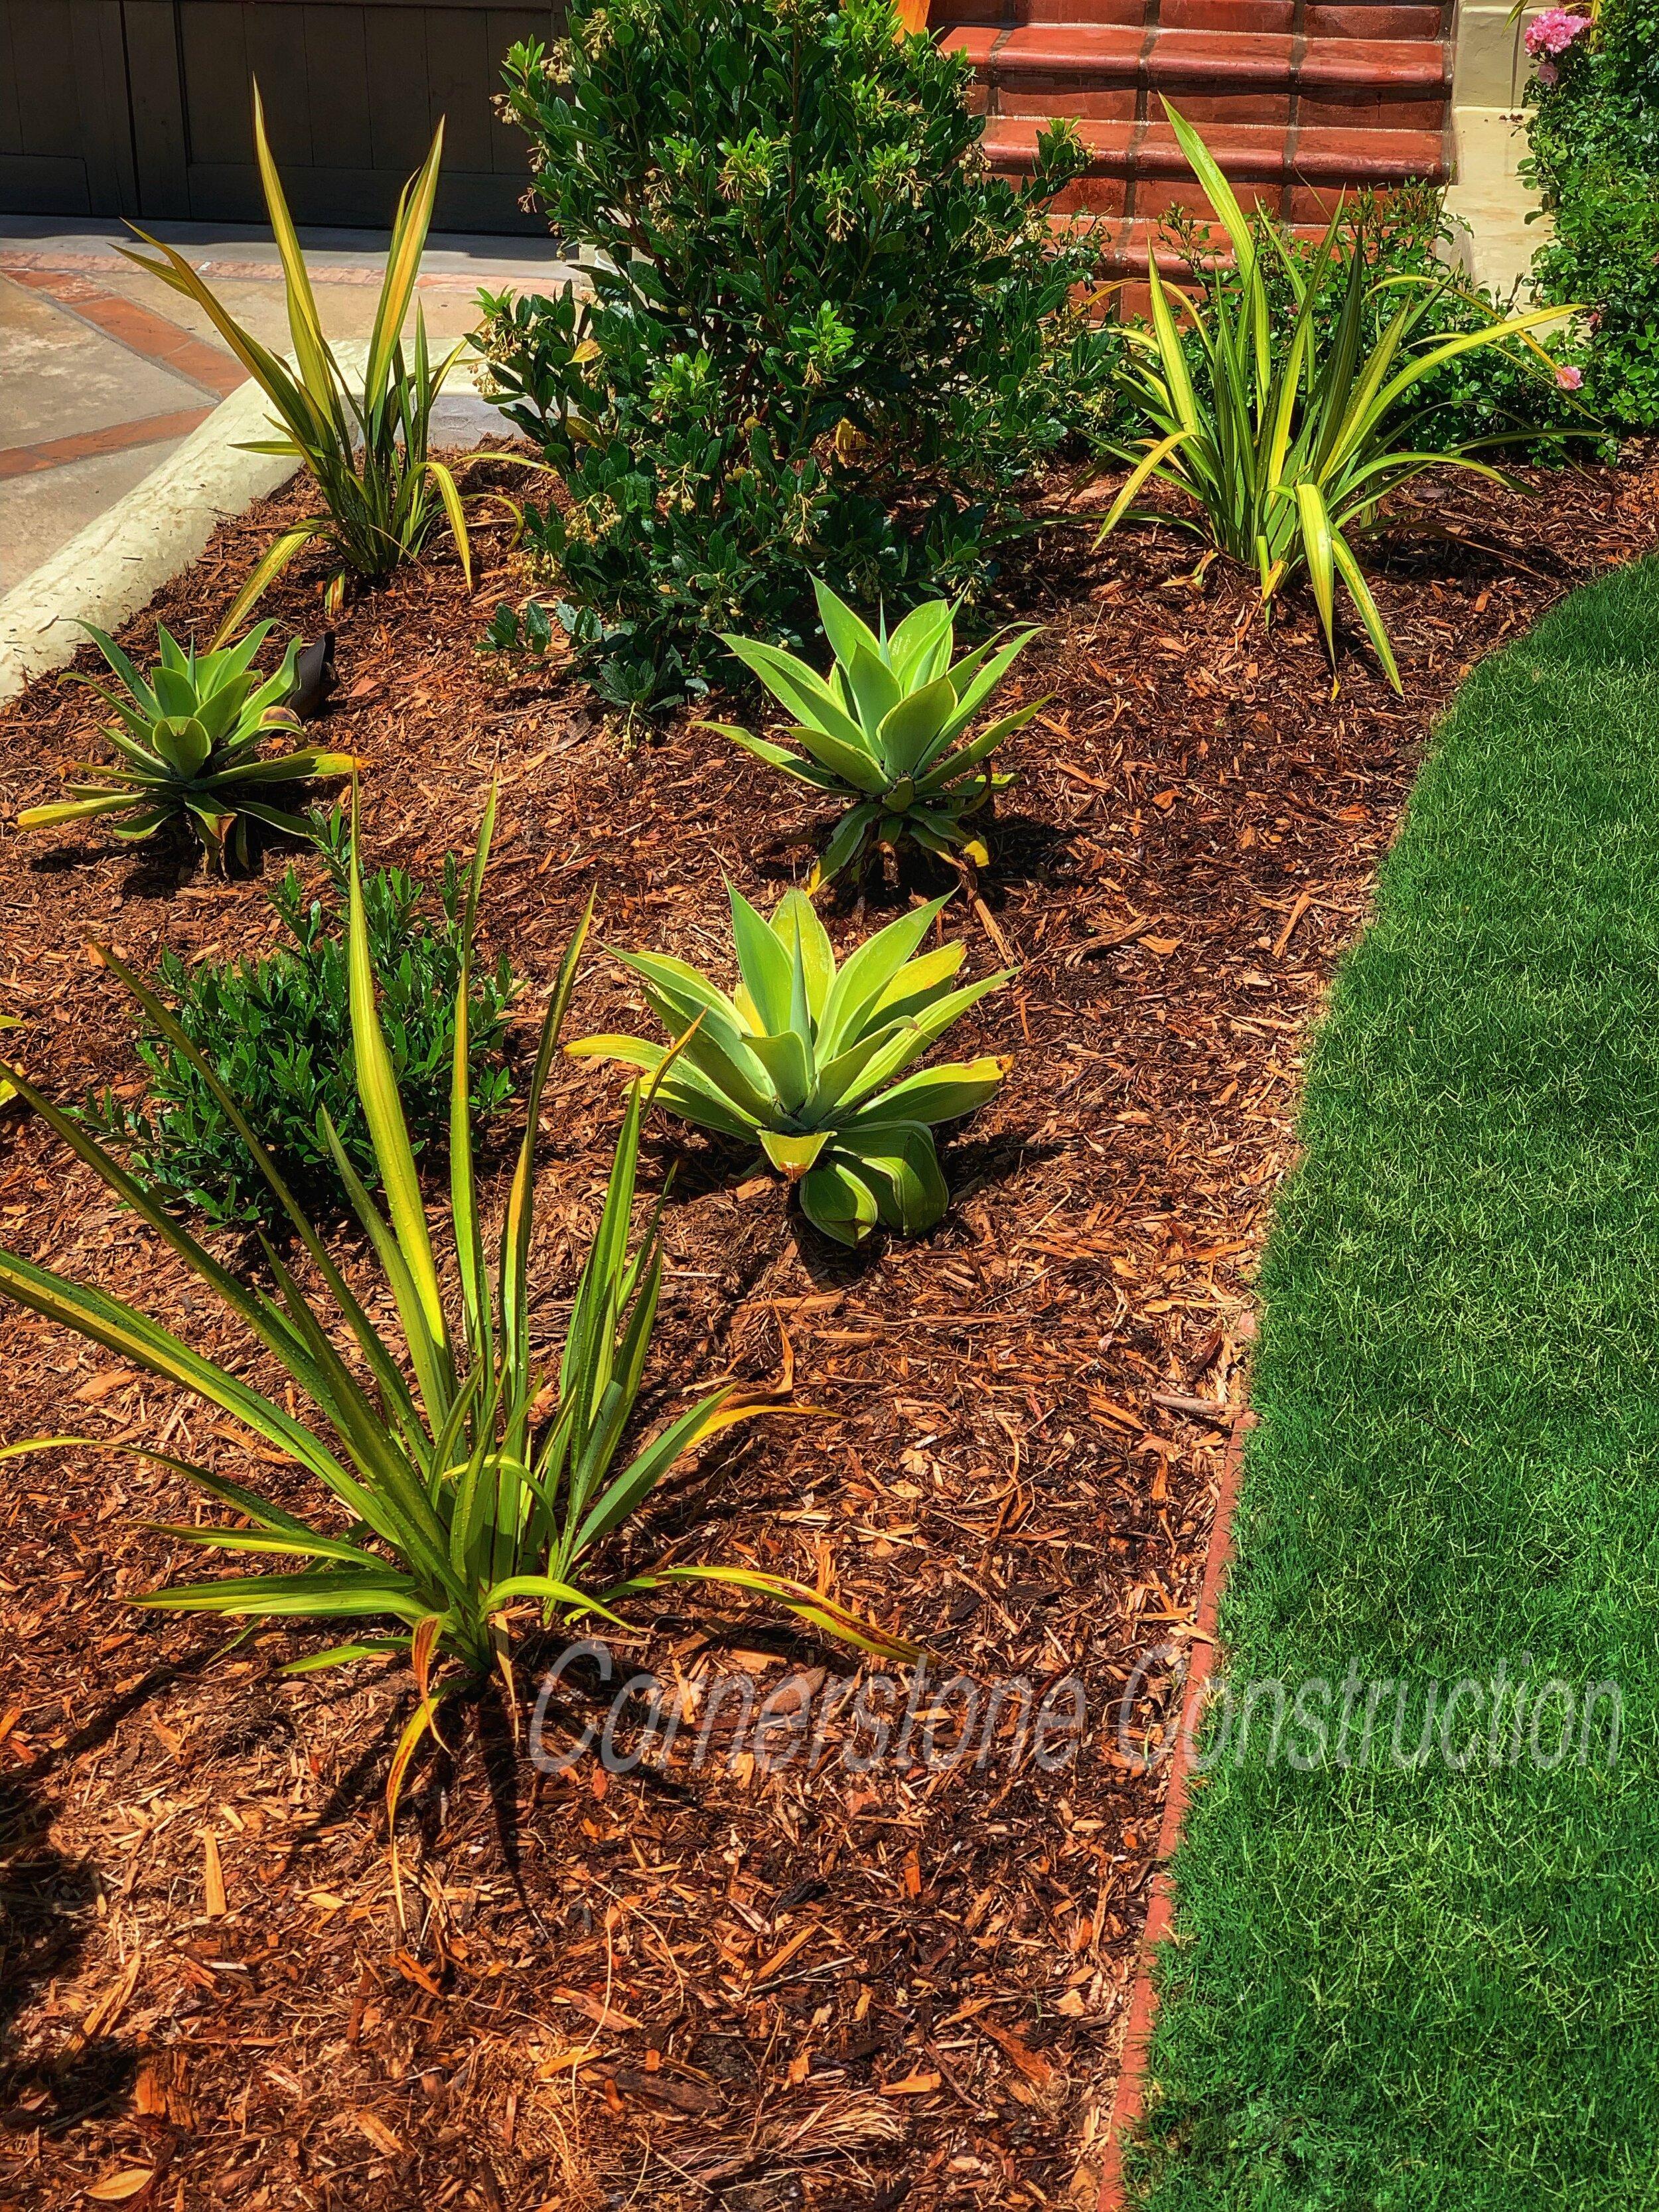 grass and mulch in backyard